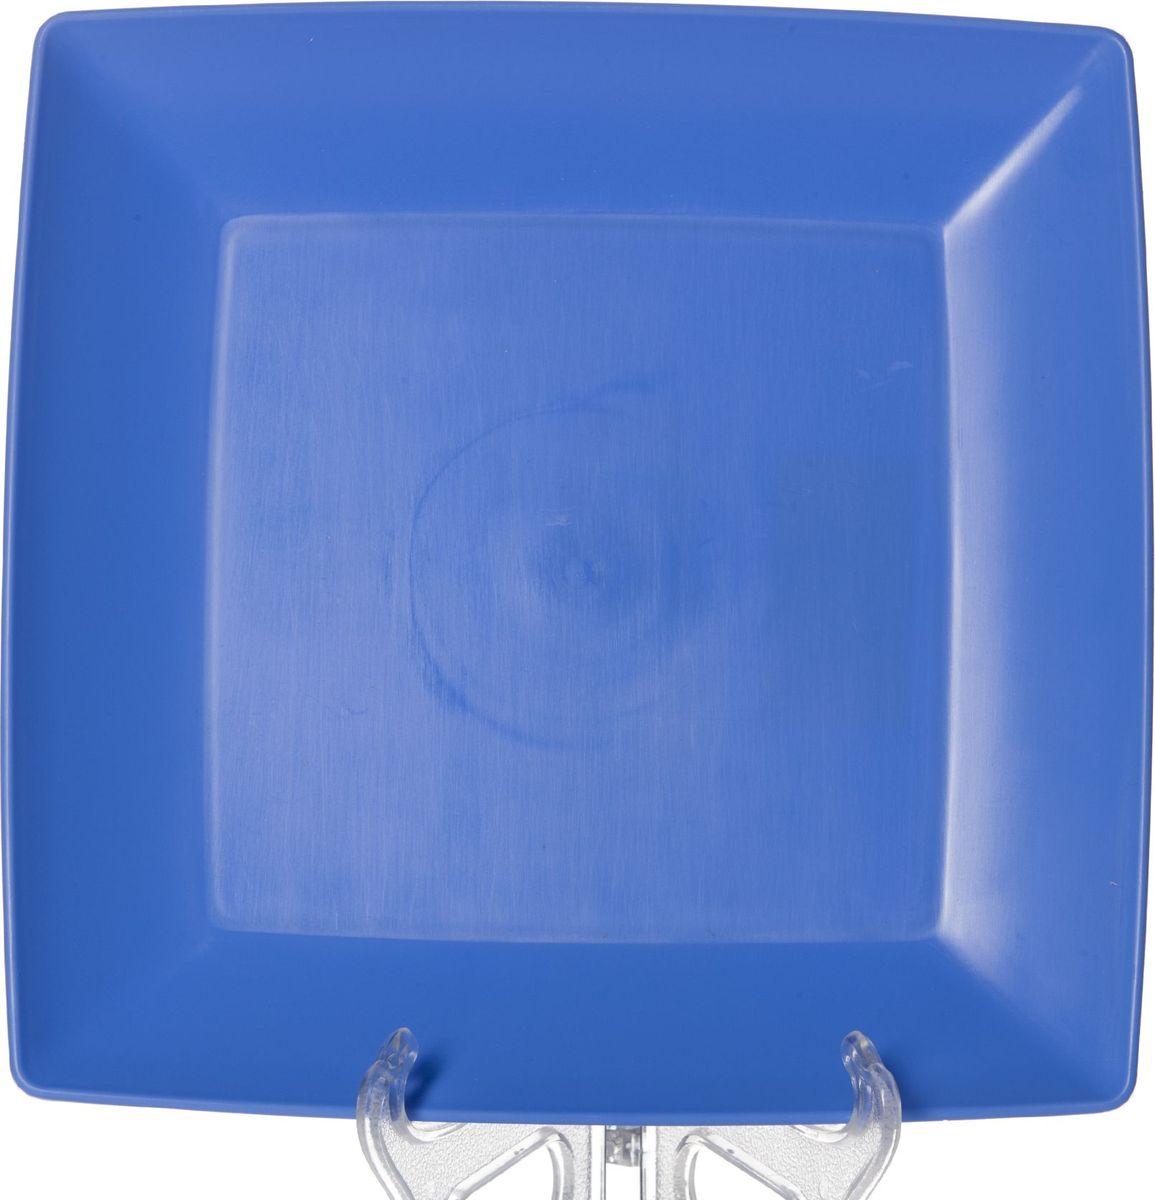 Тарелка мелкая Gotoff, 23,5 х 23,5 см. WTC-633VT-1520(SR)Тарелка квадратная мелкая 235*235*17